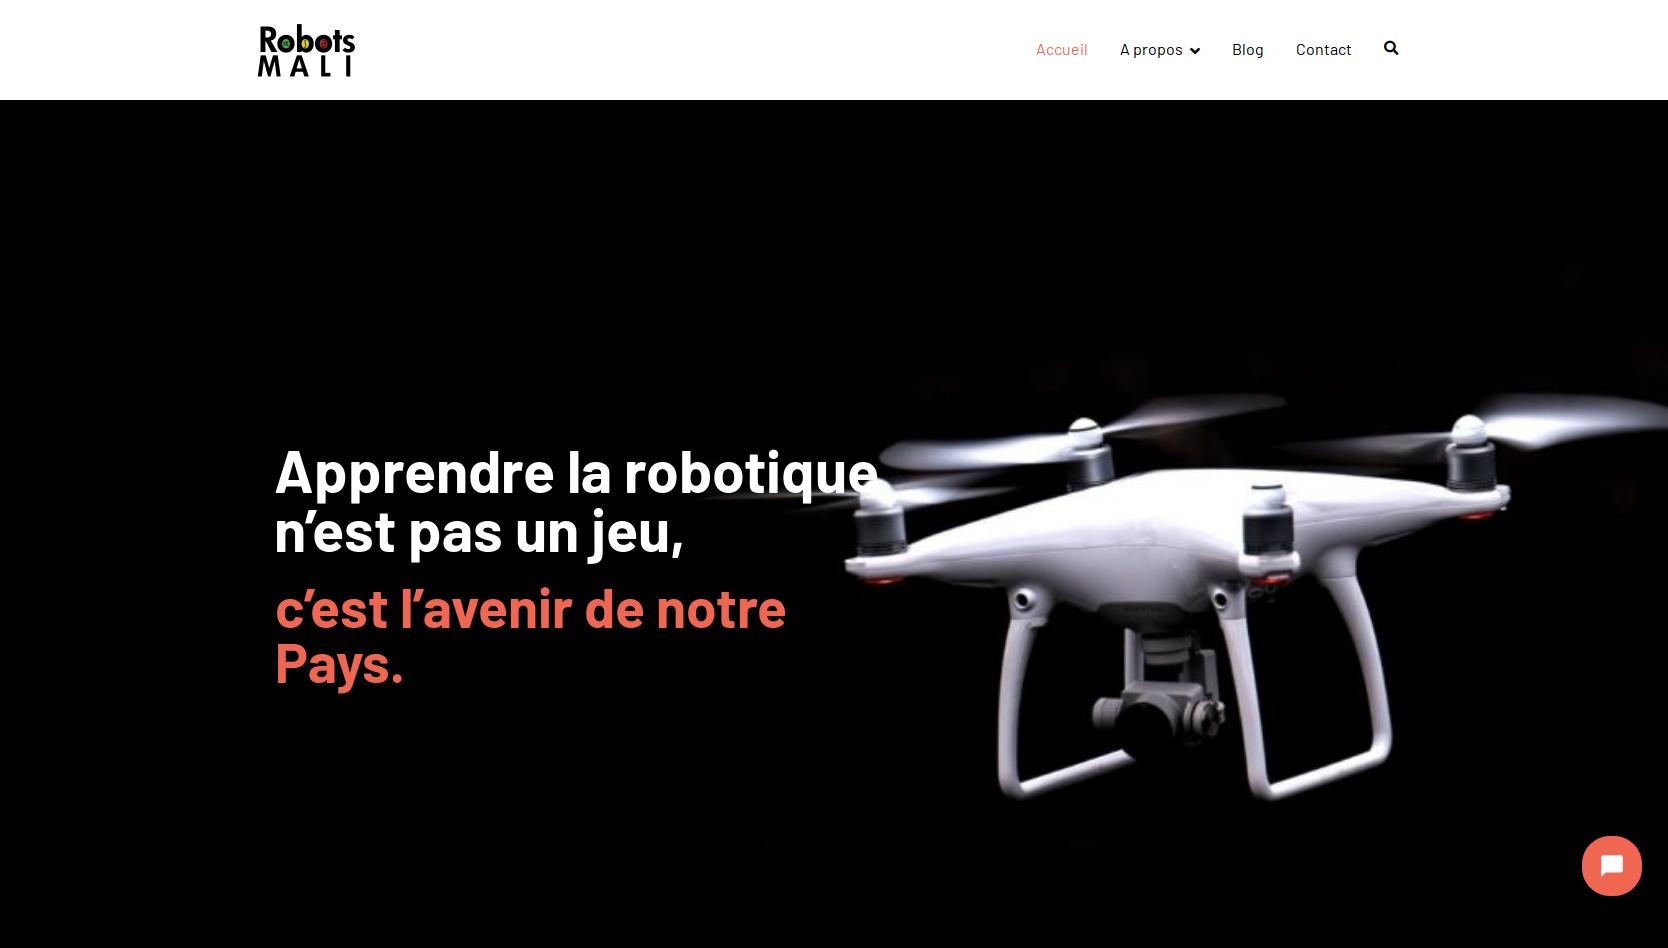 RobotsMali's website